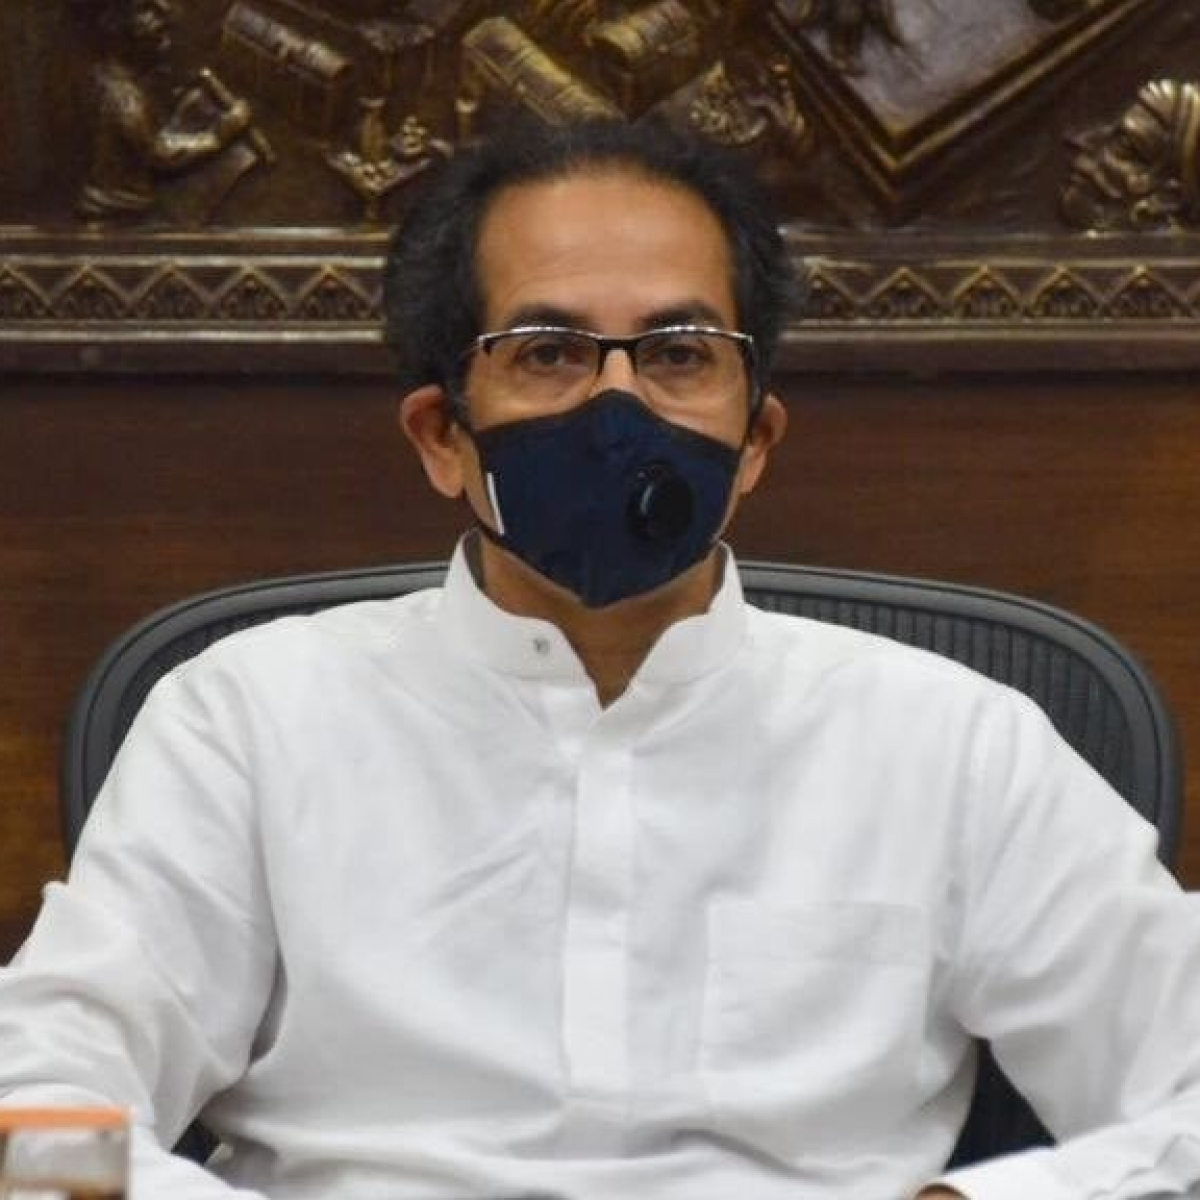 Mumbai Police's order order for action against fake news is legal: Maha govt tells Bombay High Court